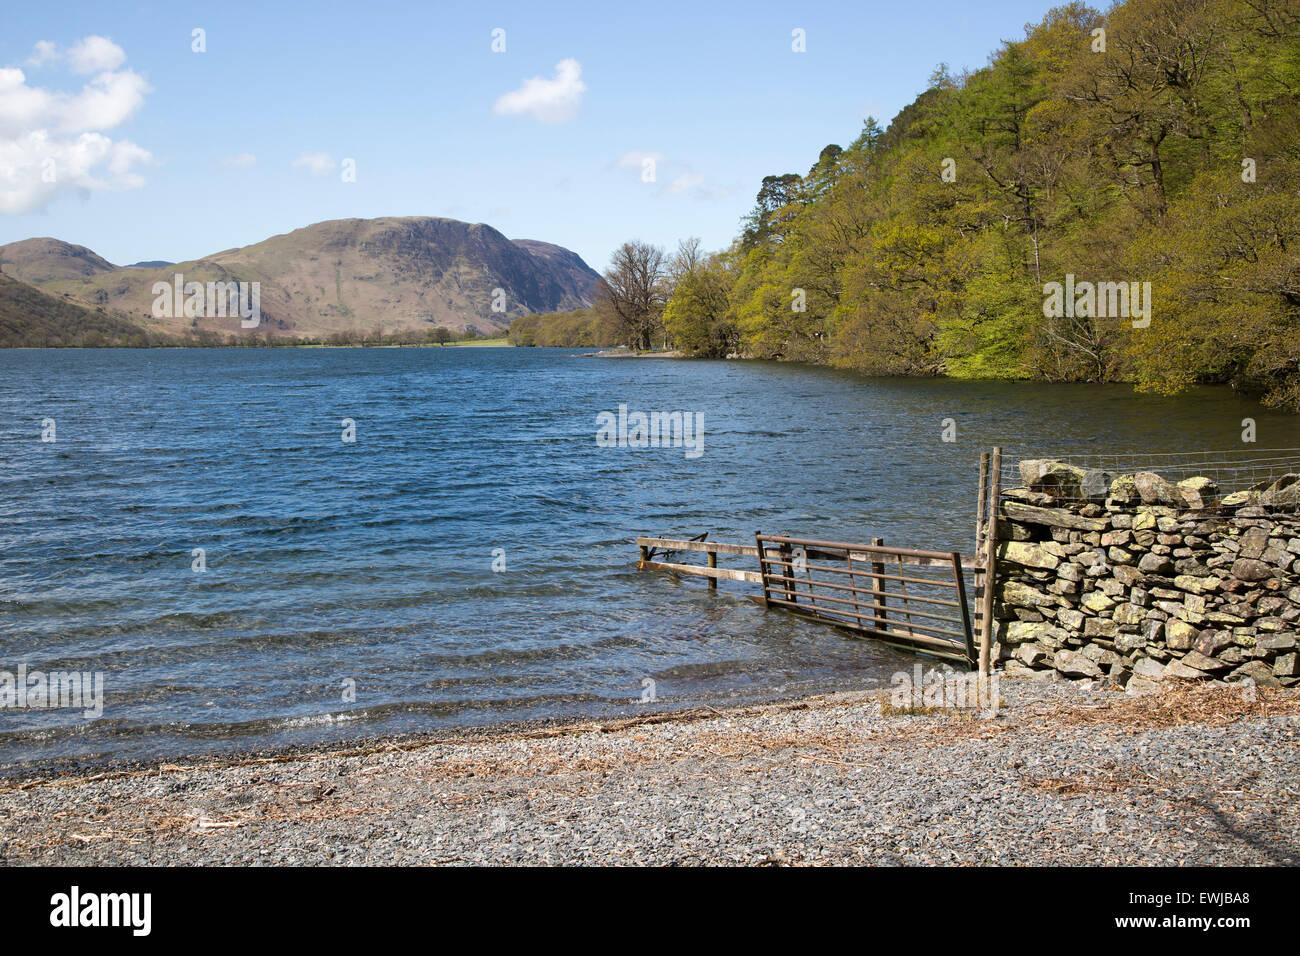 Landschaftsblick auf Lake Buttermere, Cumbria, England, UK Stockbild